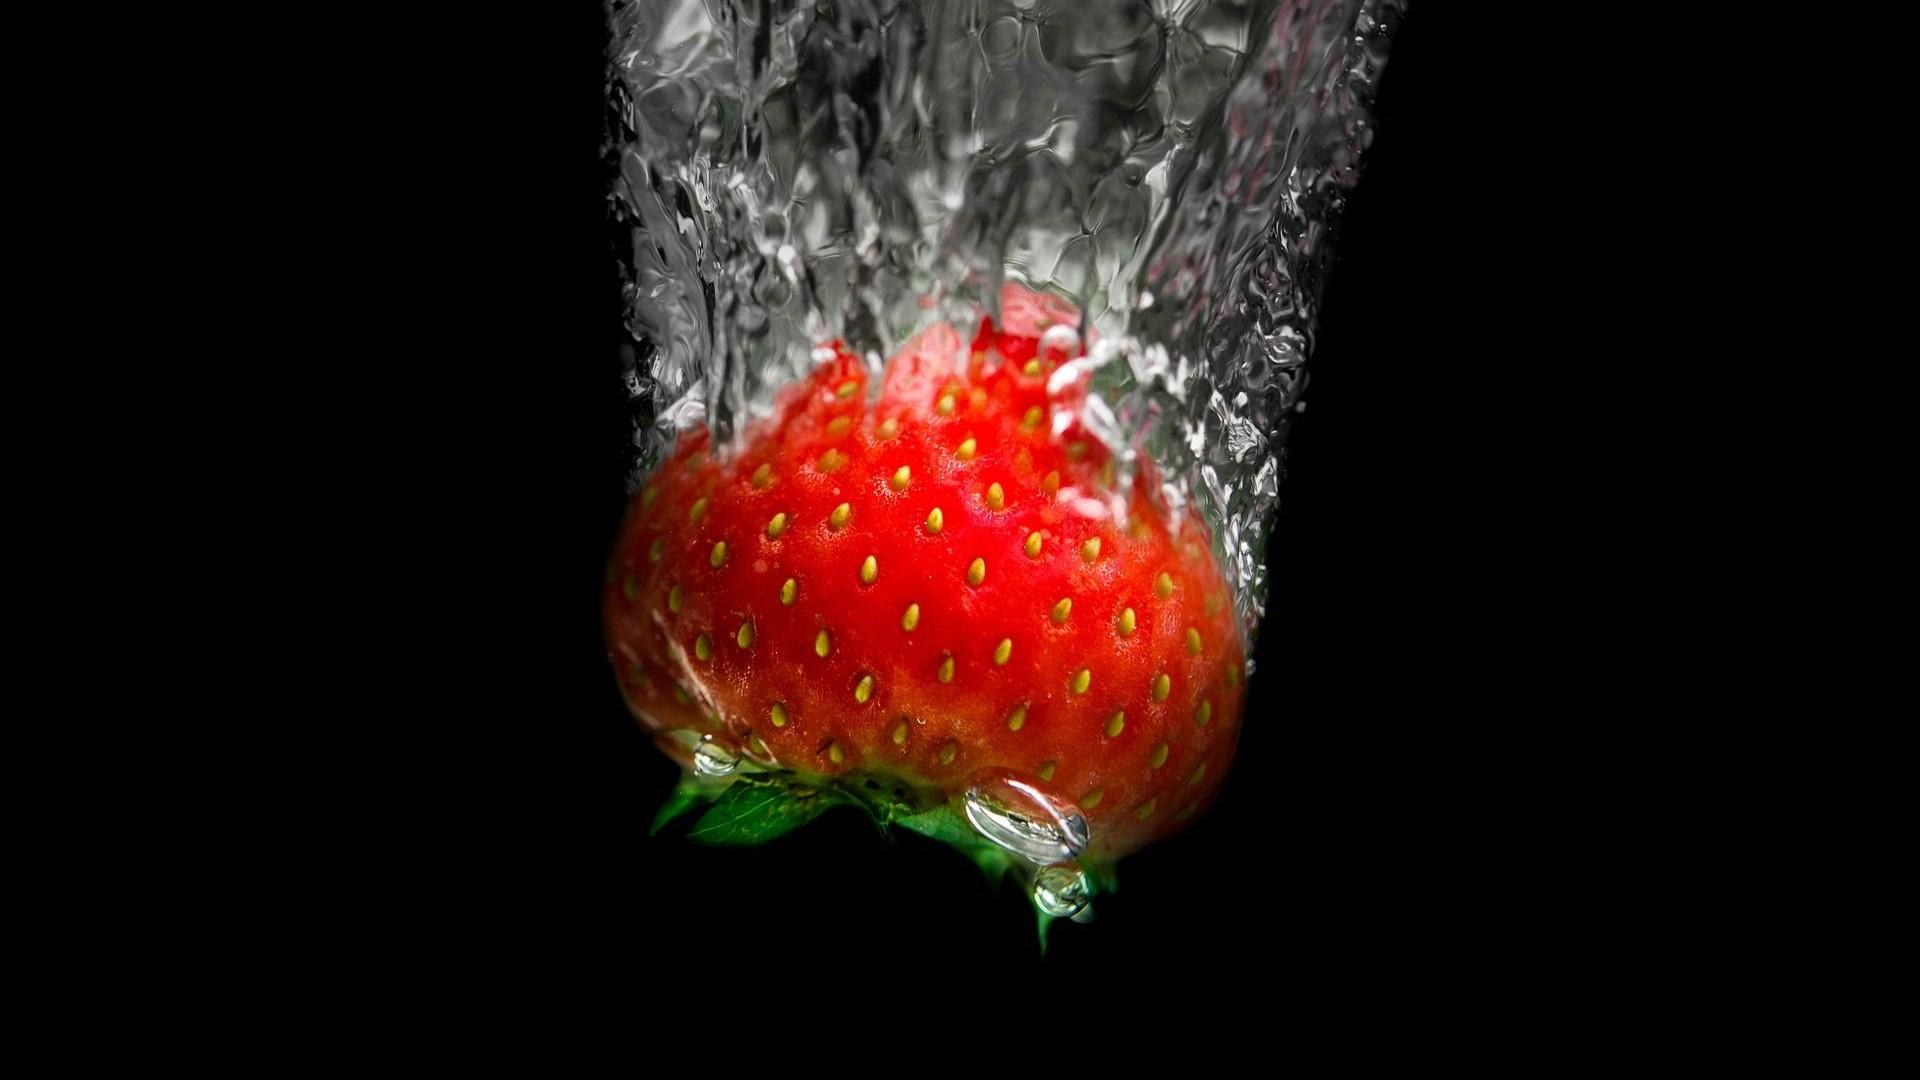 strawberry-1453070_1920